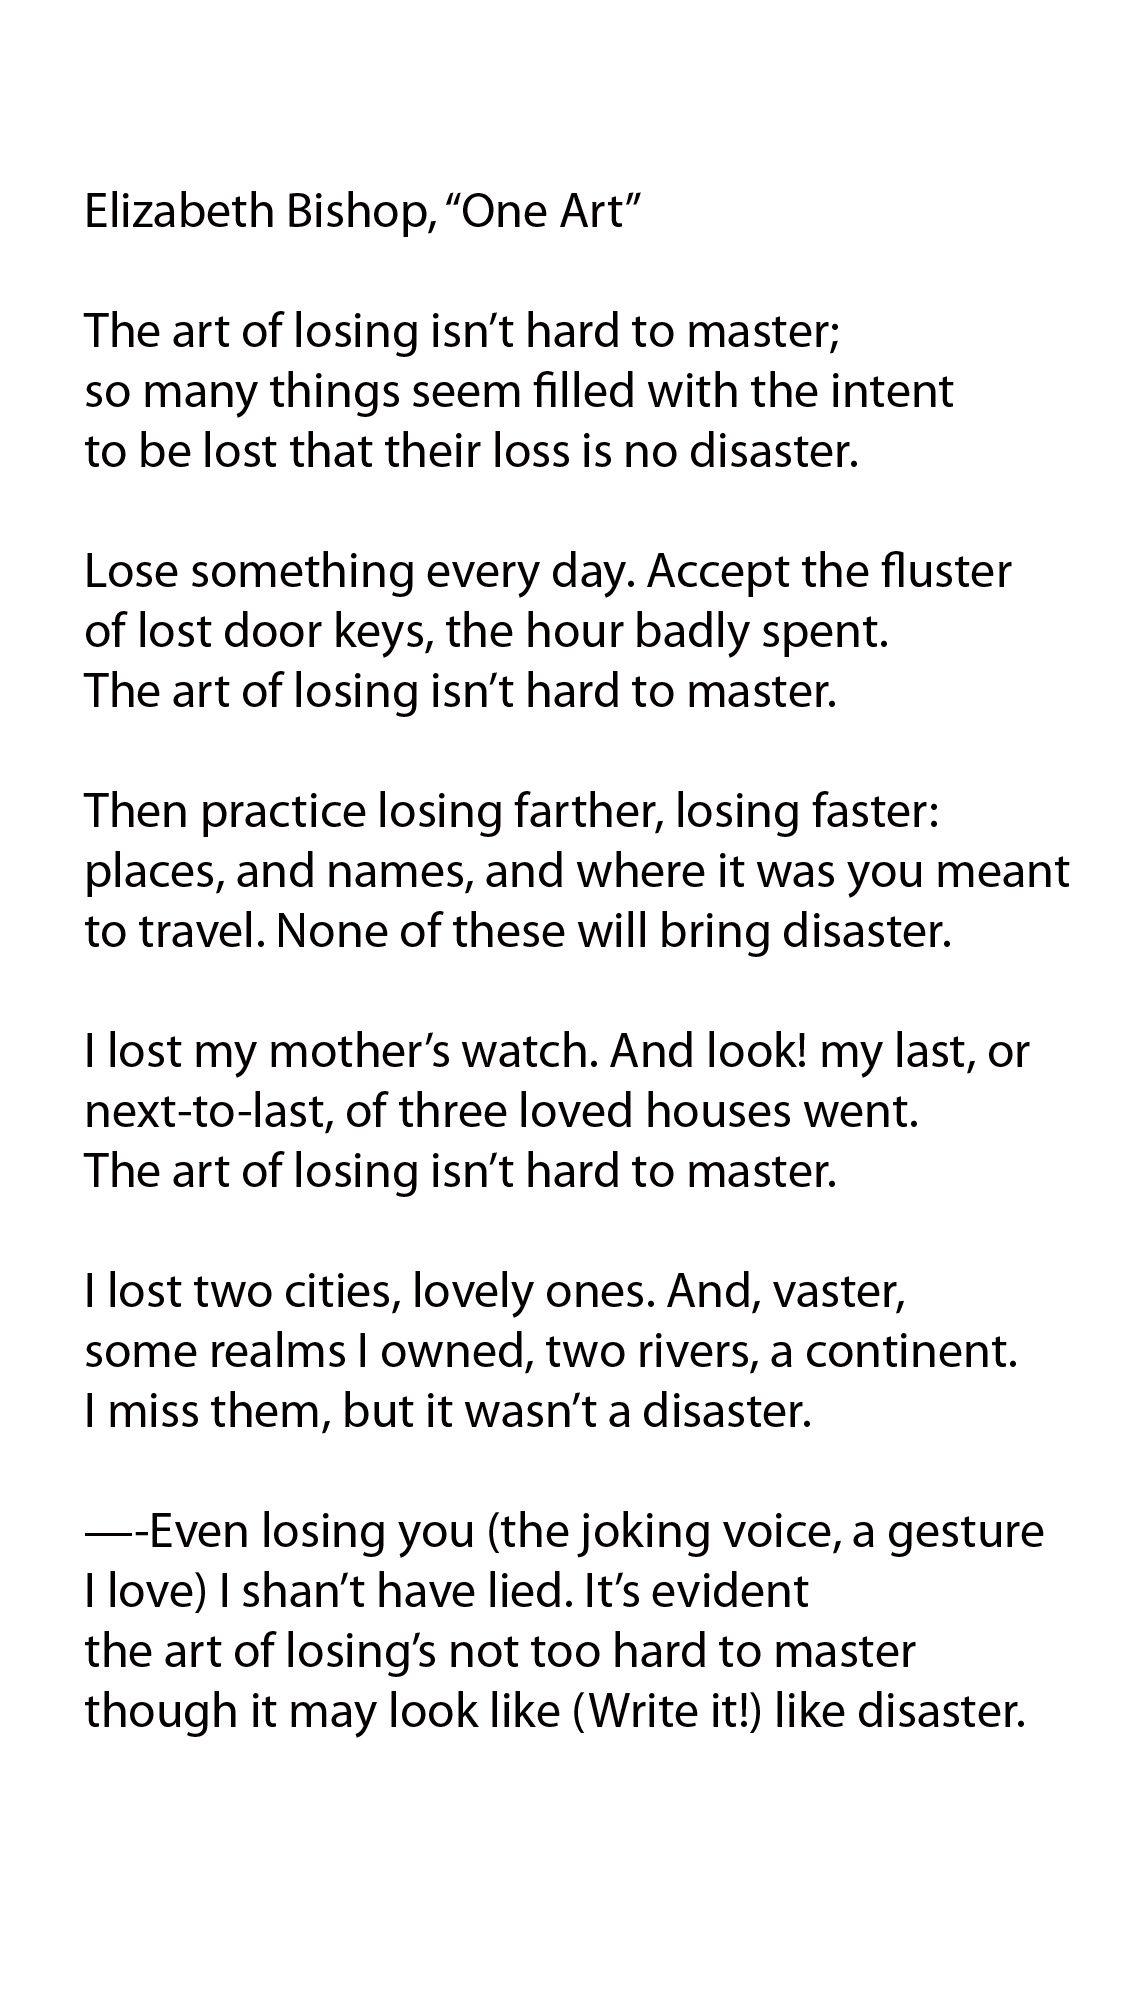 argumentative essay poem